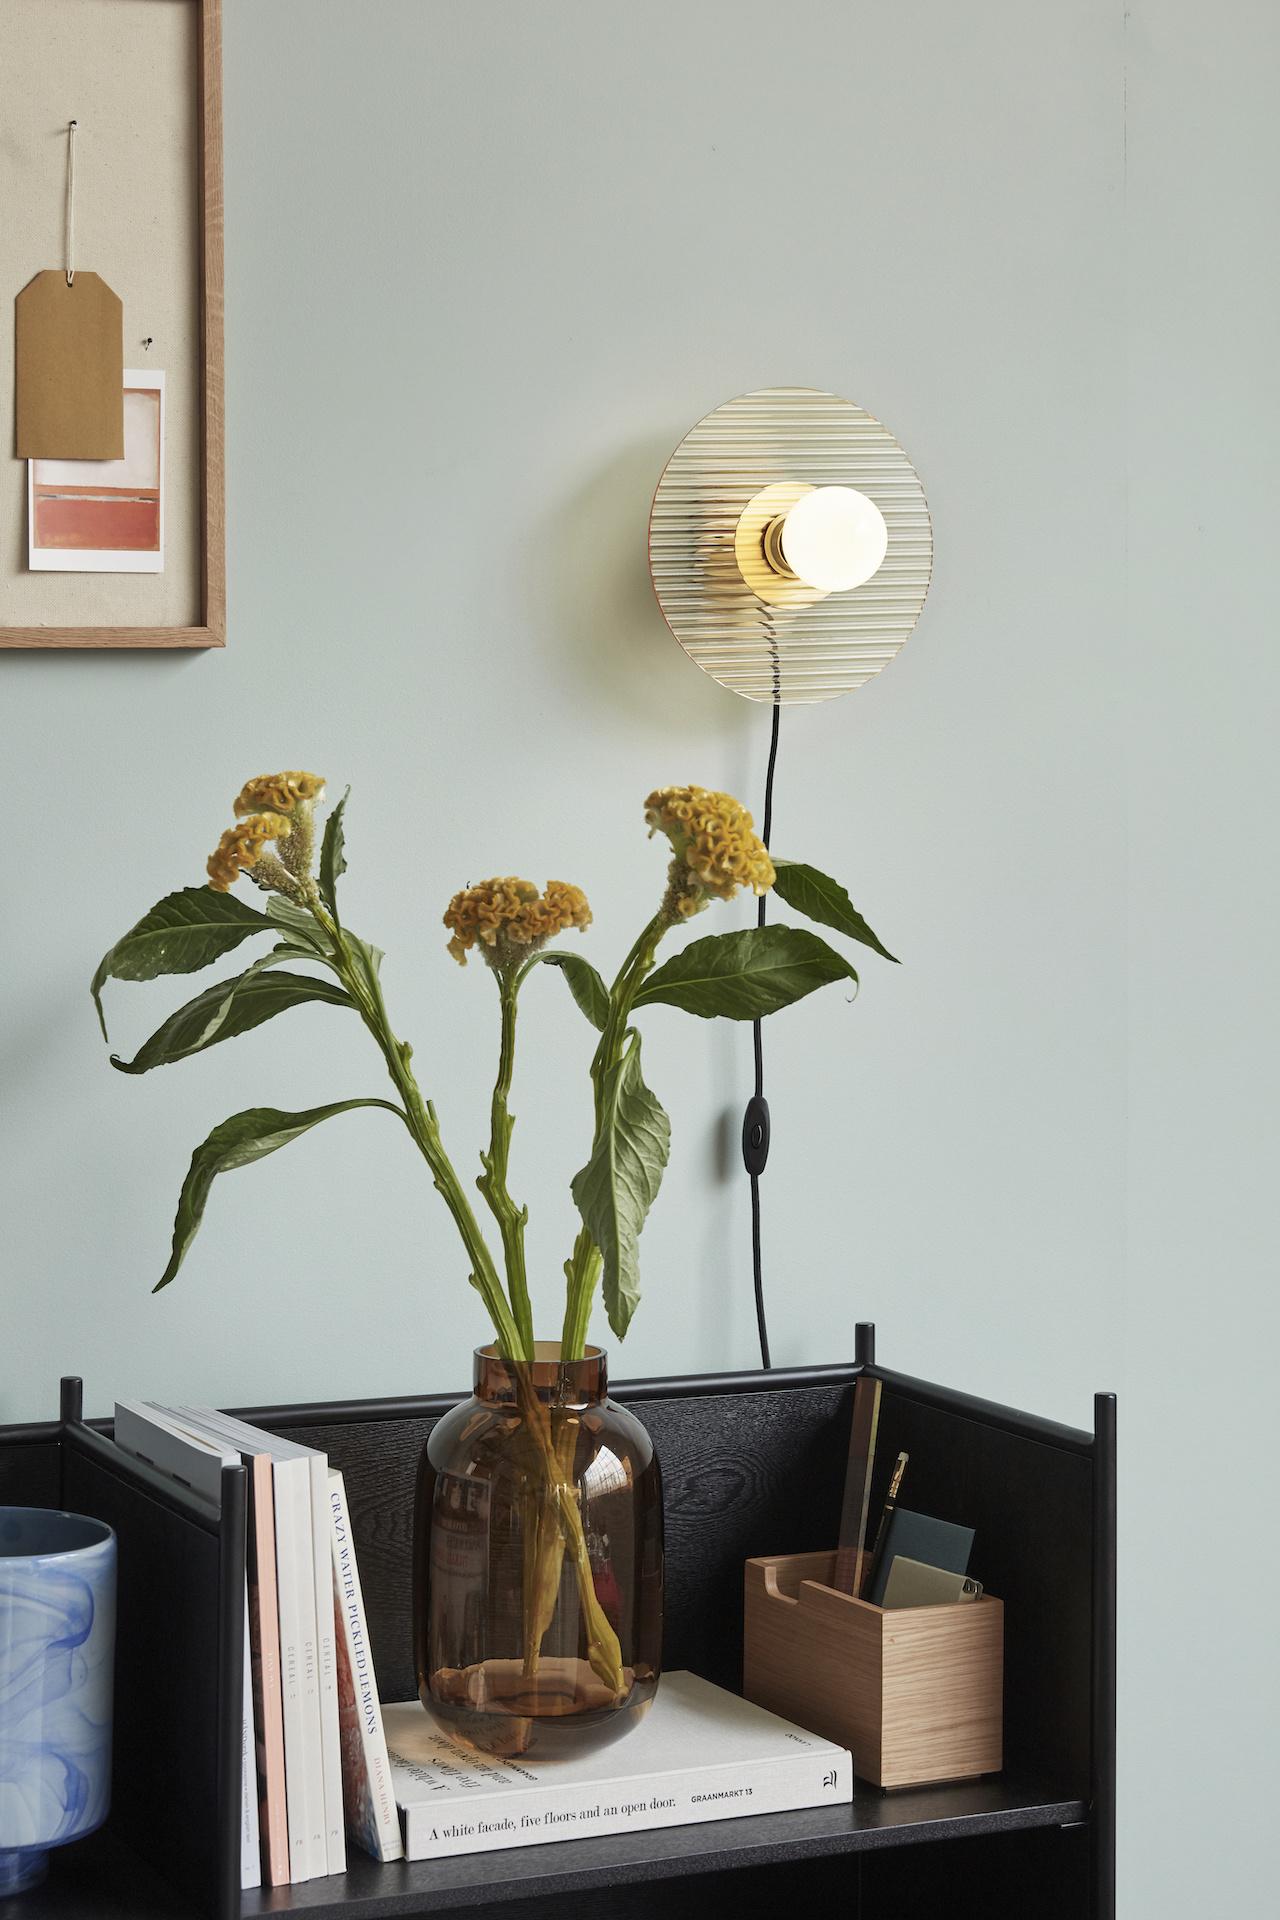 Hubsch Wandlamp Amber met lichtbron-991203-5712772102190